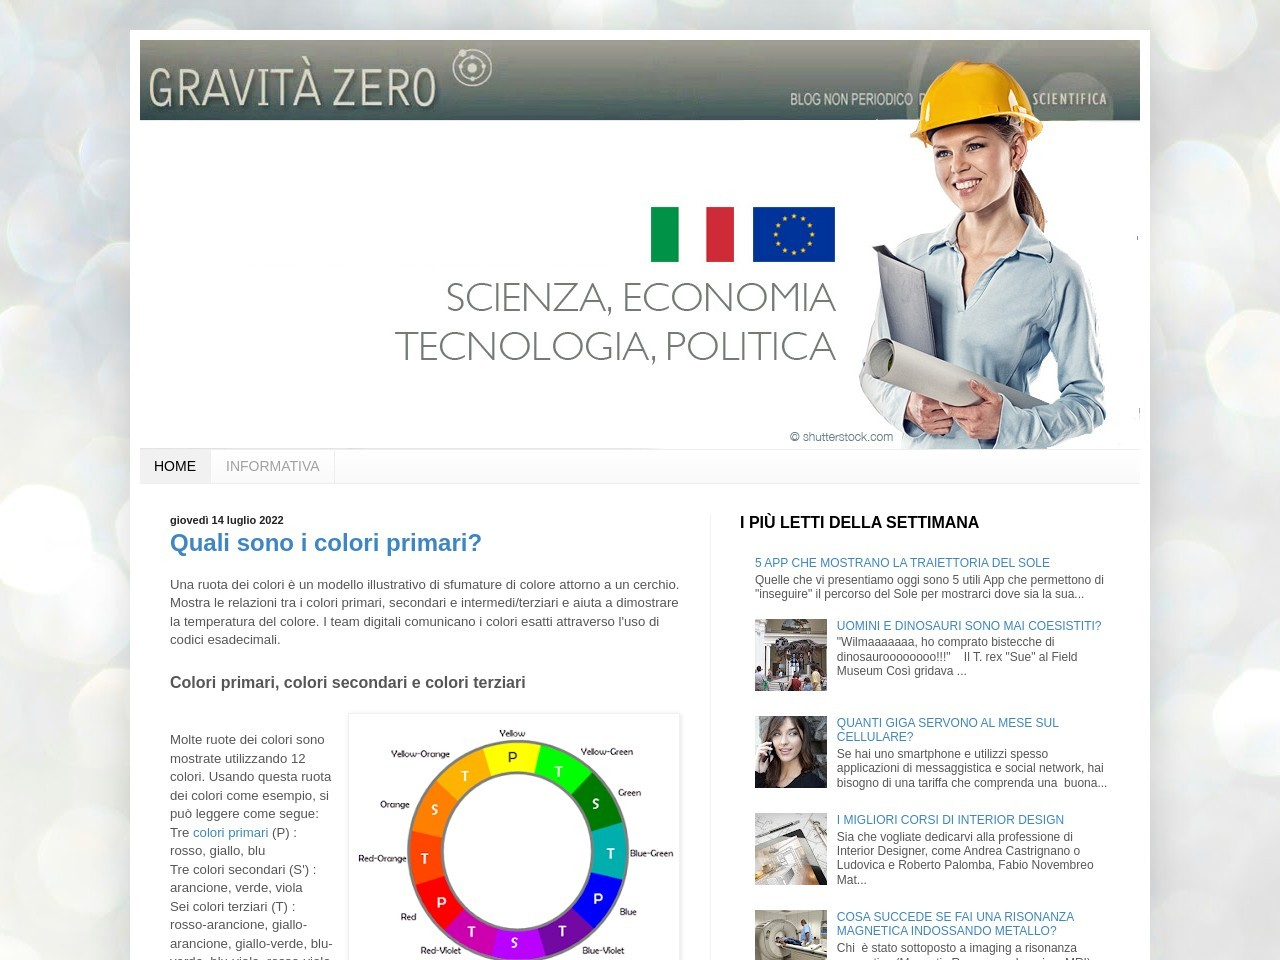 www-gravita-zero-org